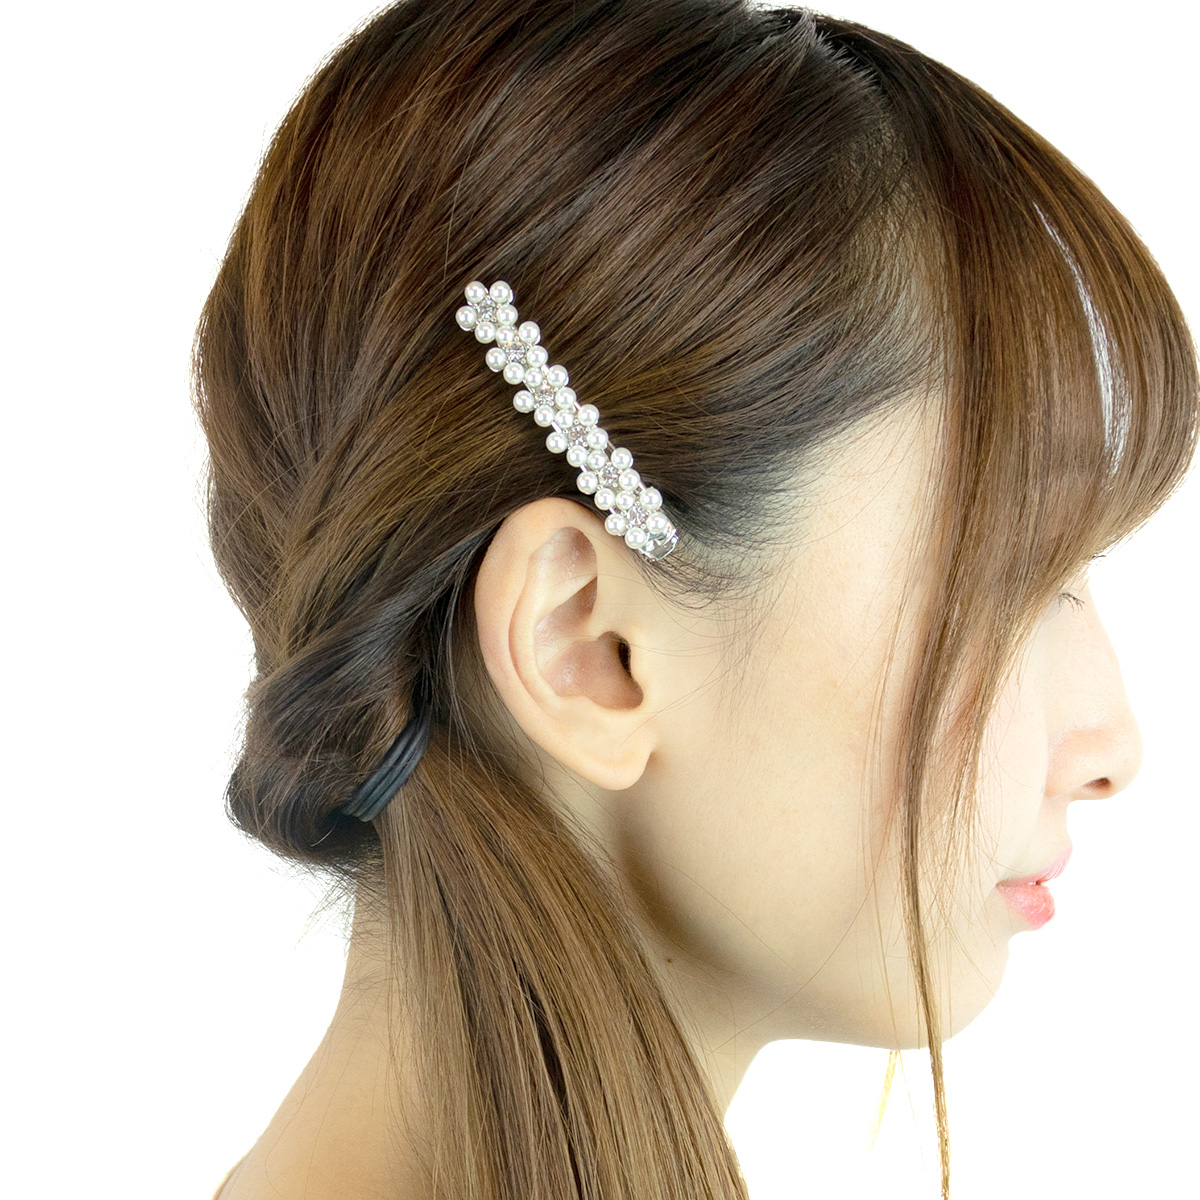 STUNNING RHINESTONE CZECH FLOWER NEW WOMAN BARRETTE CLIP HAIR CLIPS SLIDES